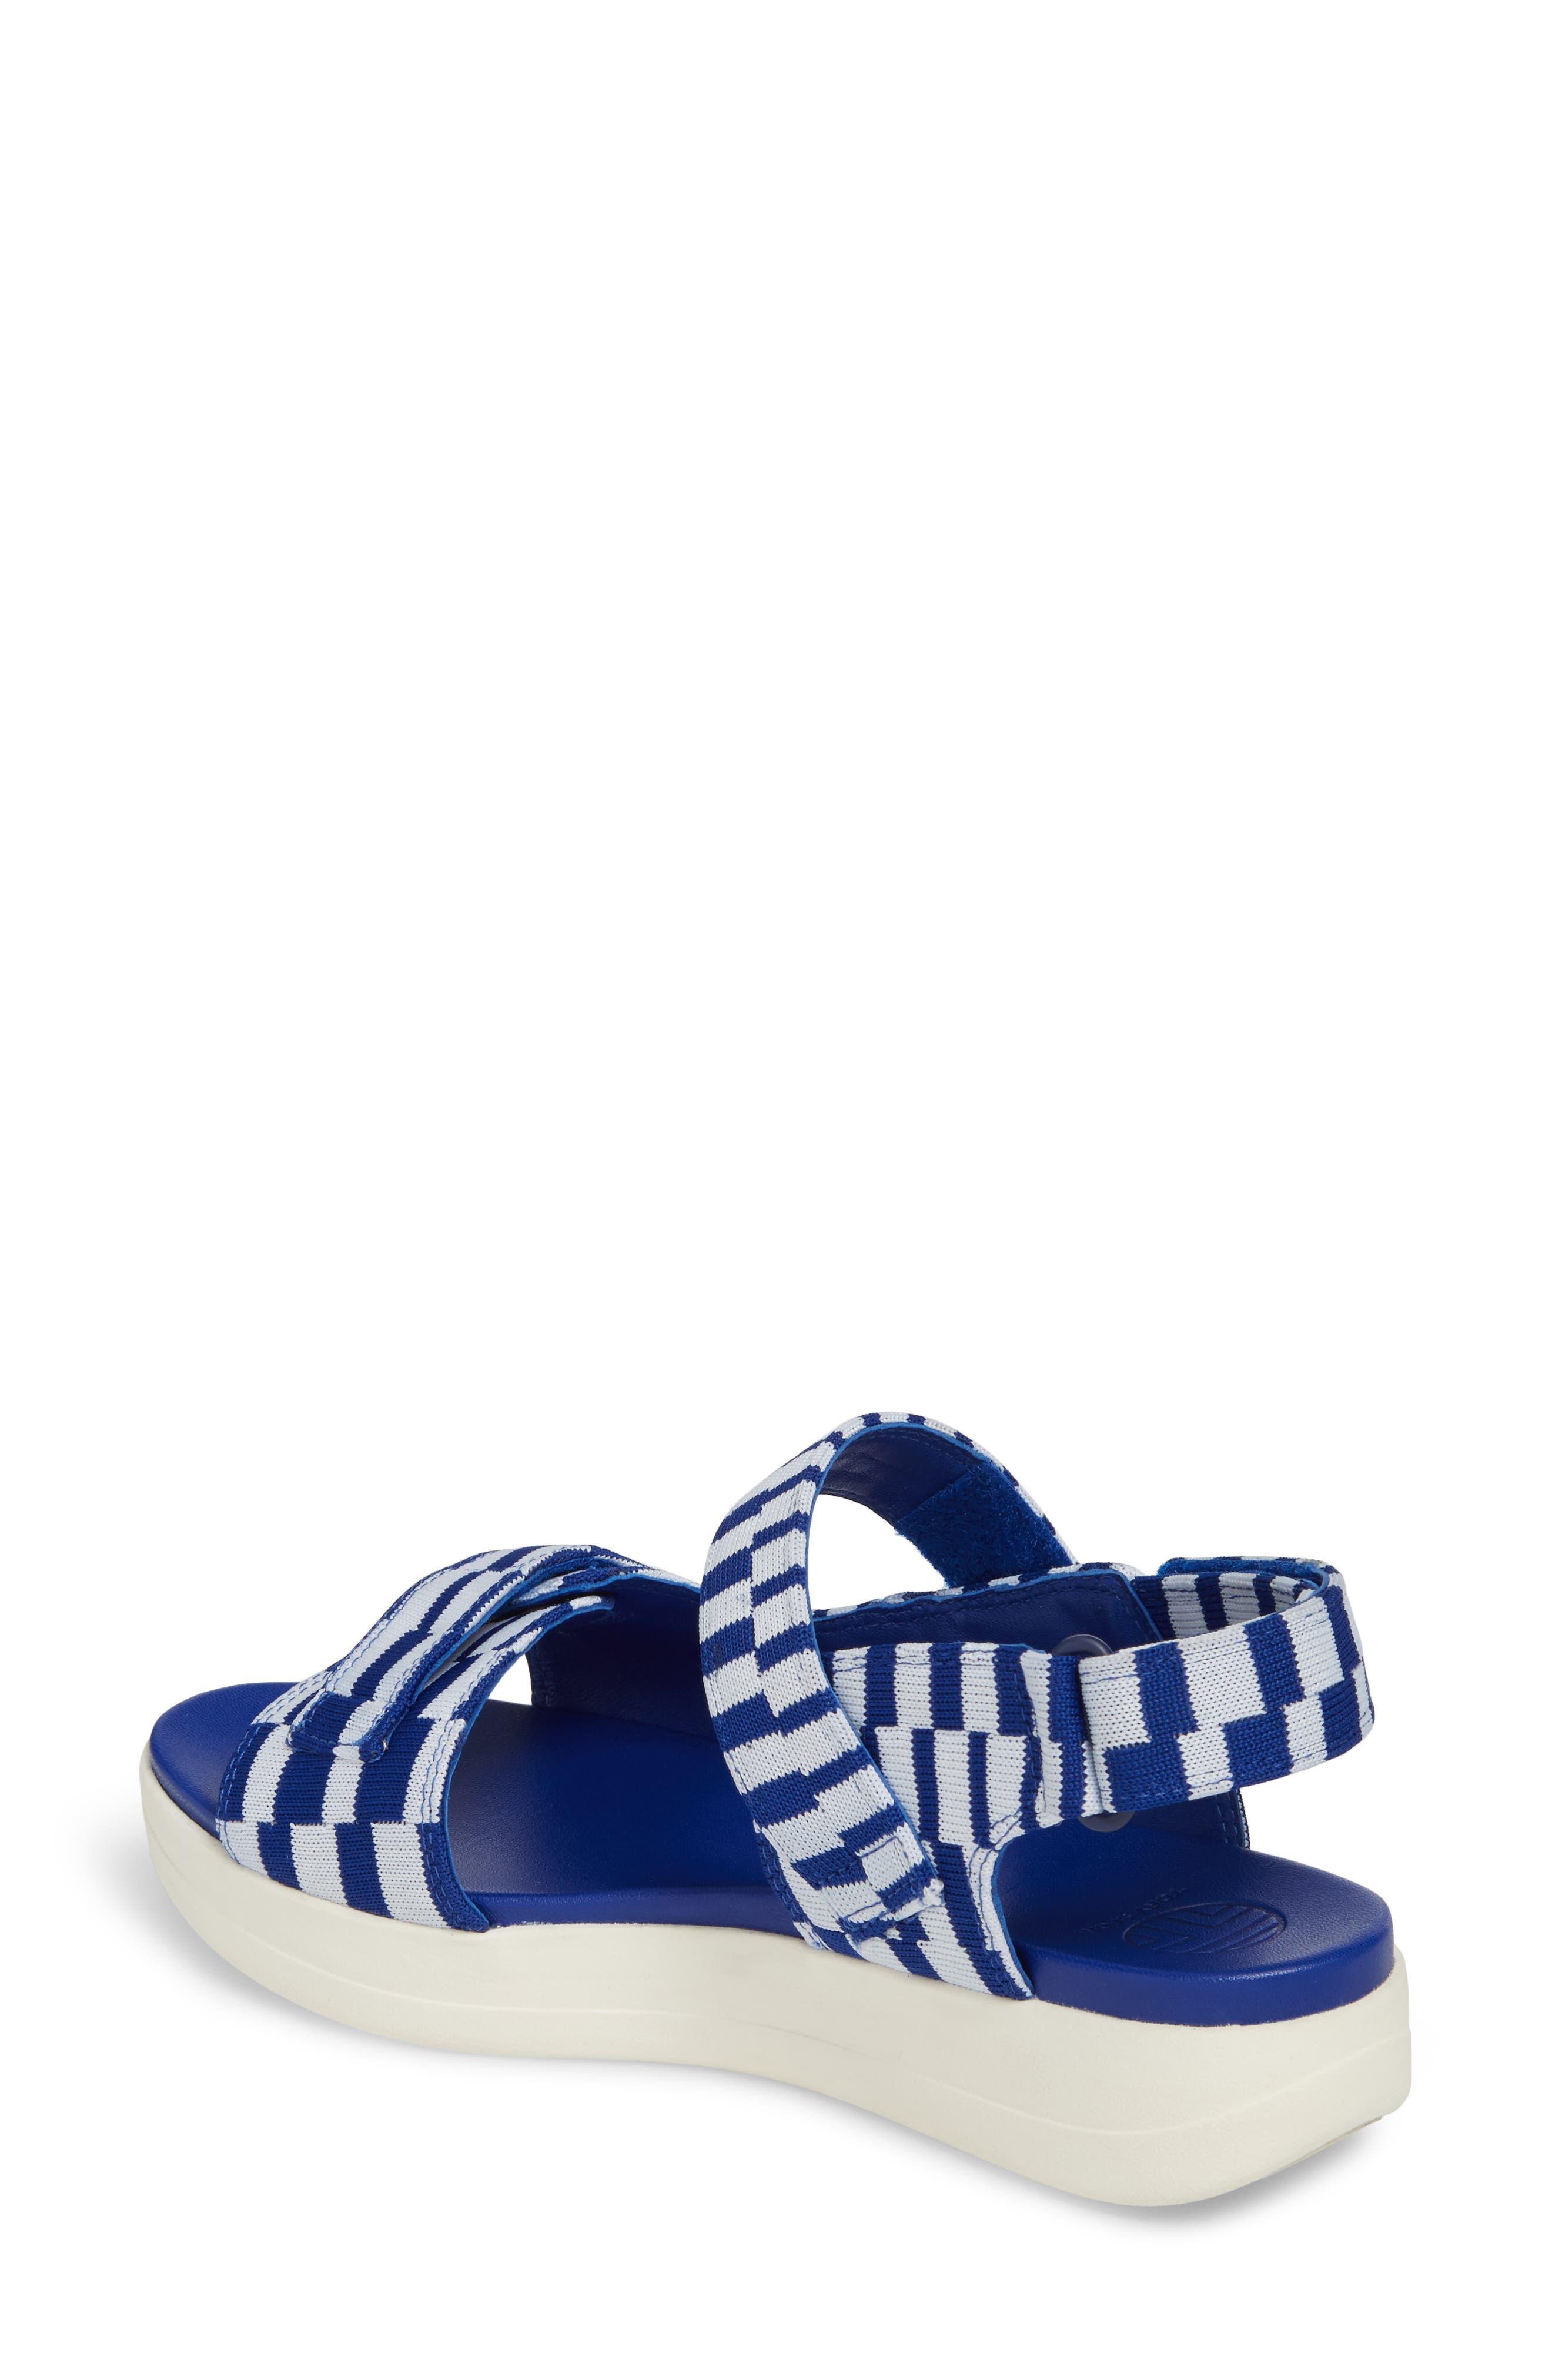 Flatform Sandal,                             Alternate thumbnail 2, color,                             Check Slalom Blue